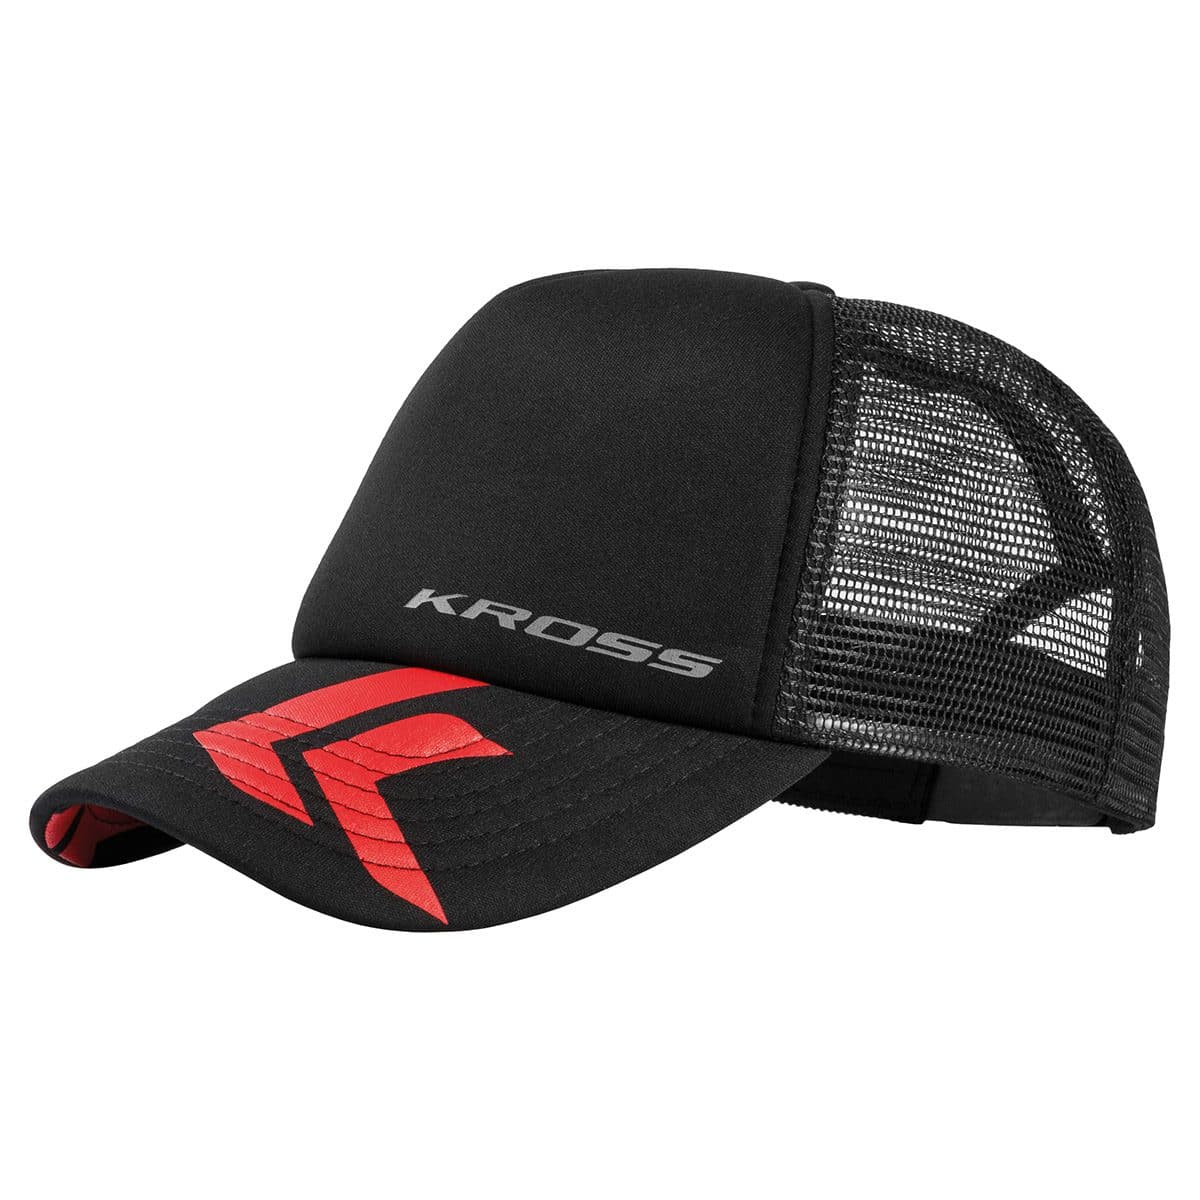 Kross T-CAP  - rowery  - Rowerowy Sam